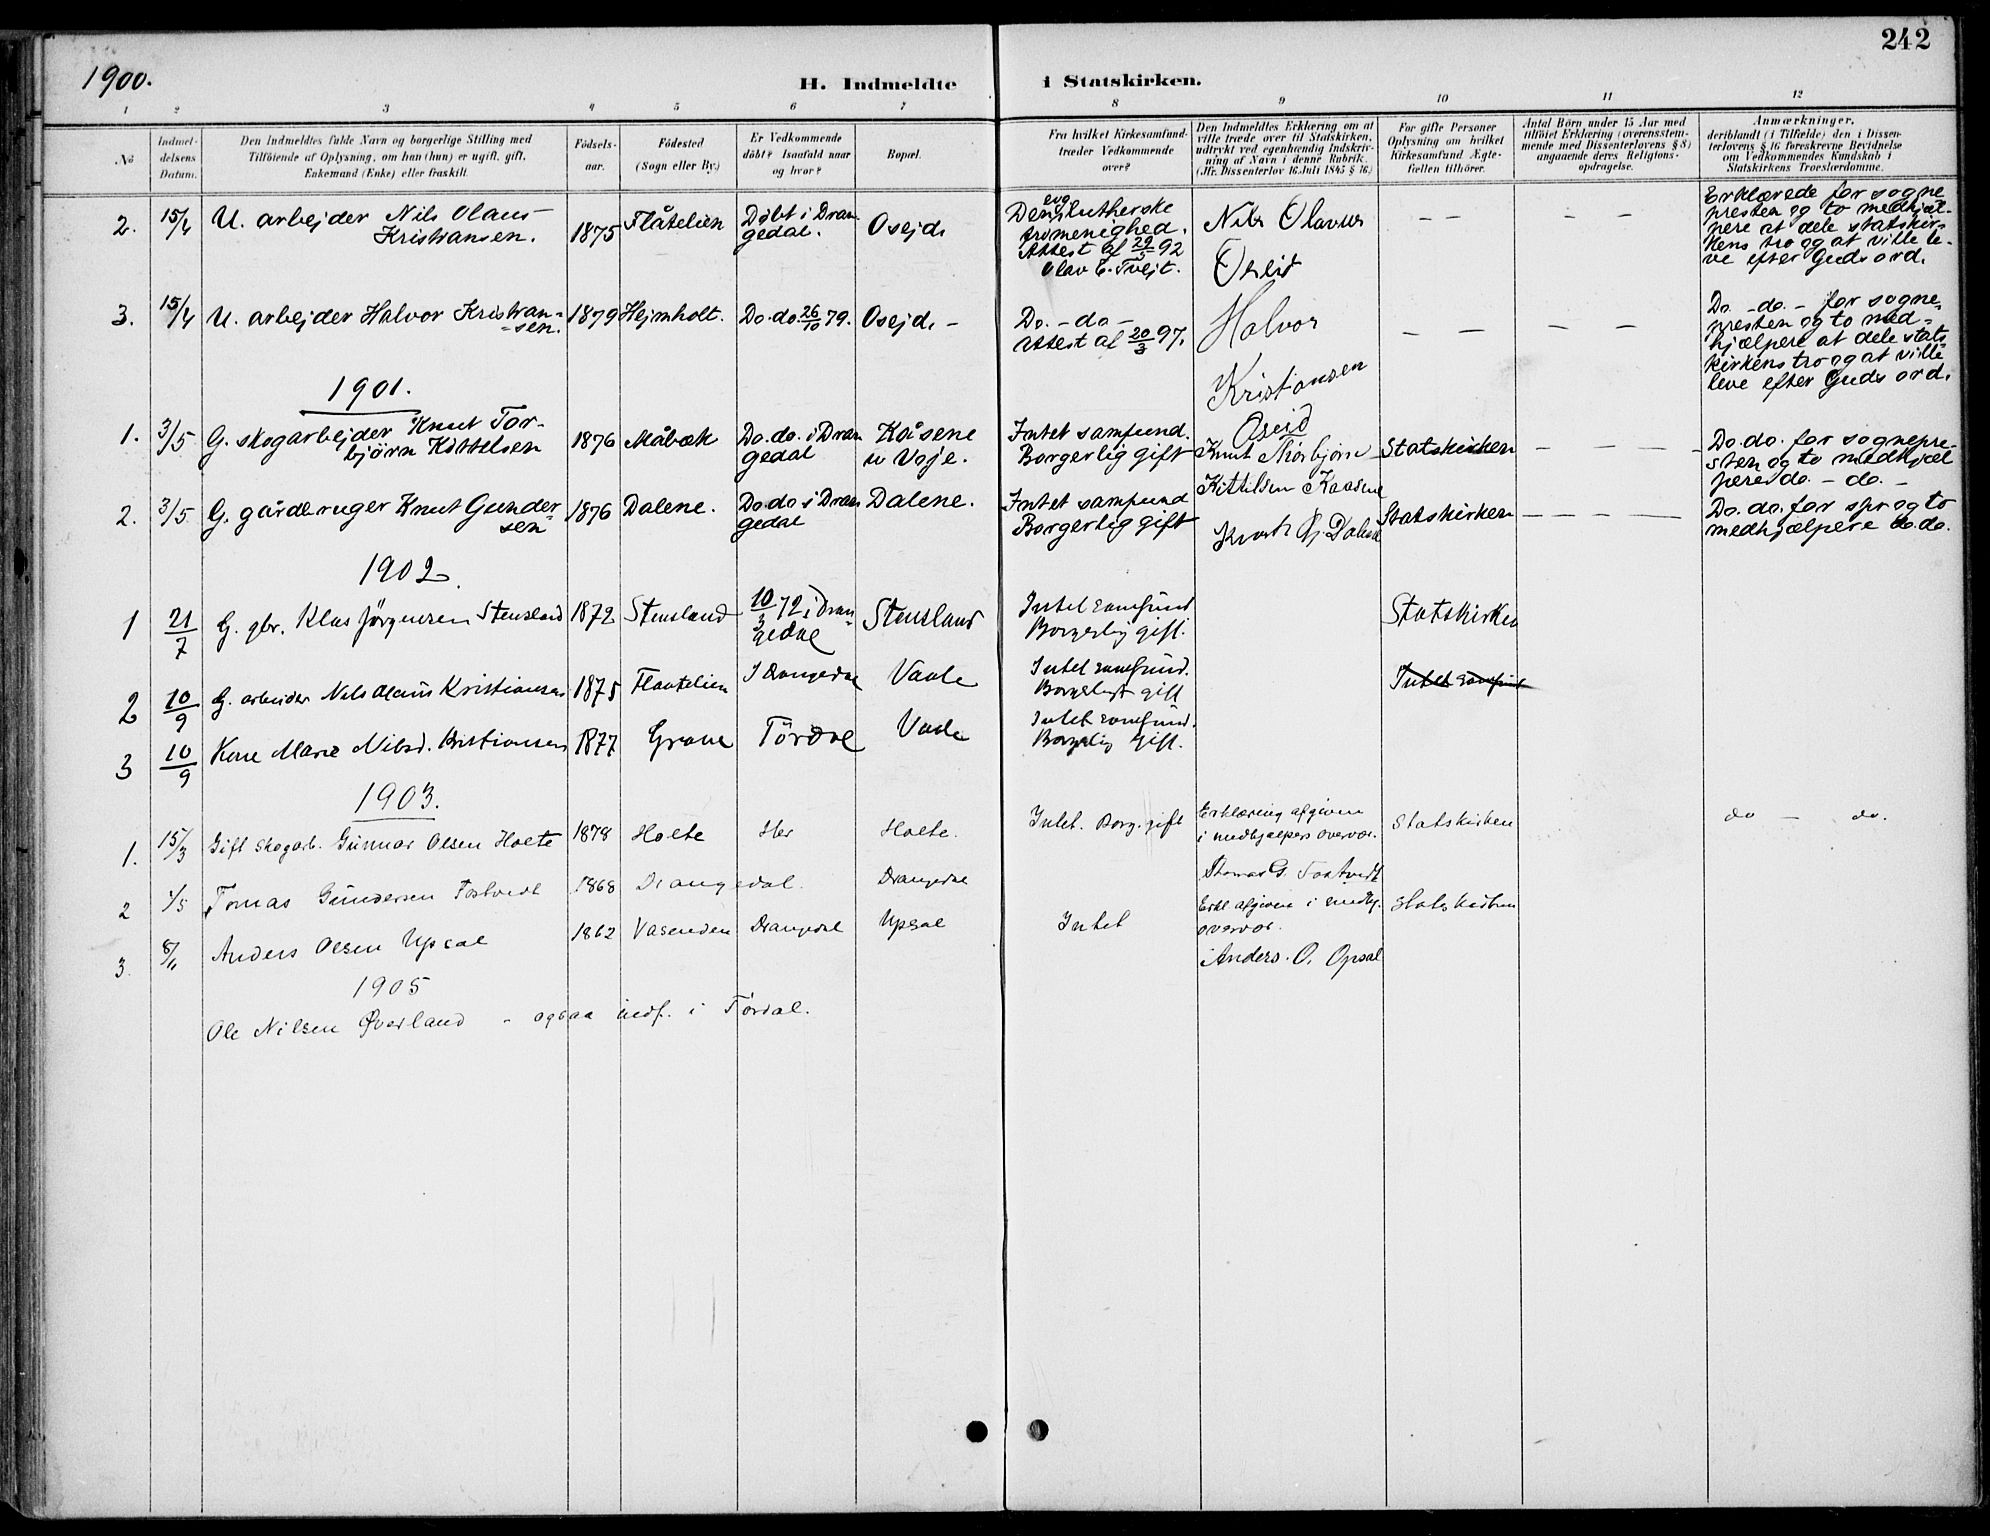 SAKO, Drangedal kirkebøker, F/Fa/L0012: Ministerialbok nr. 12, 1895-1905, s. 242